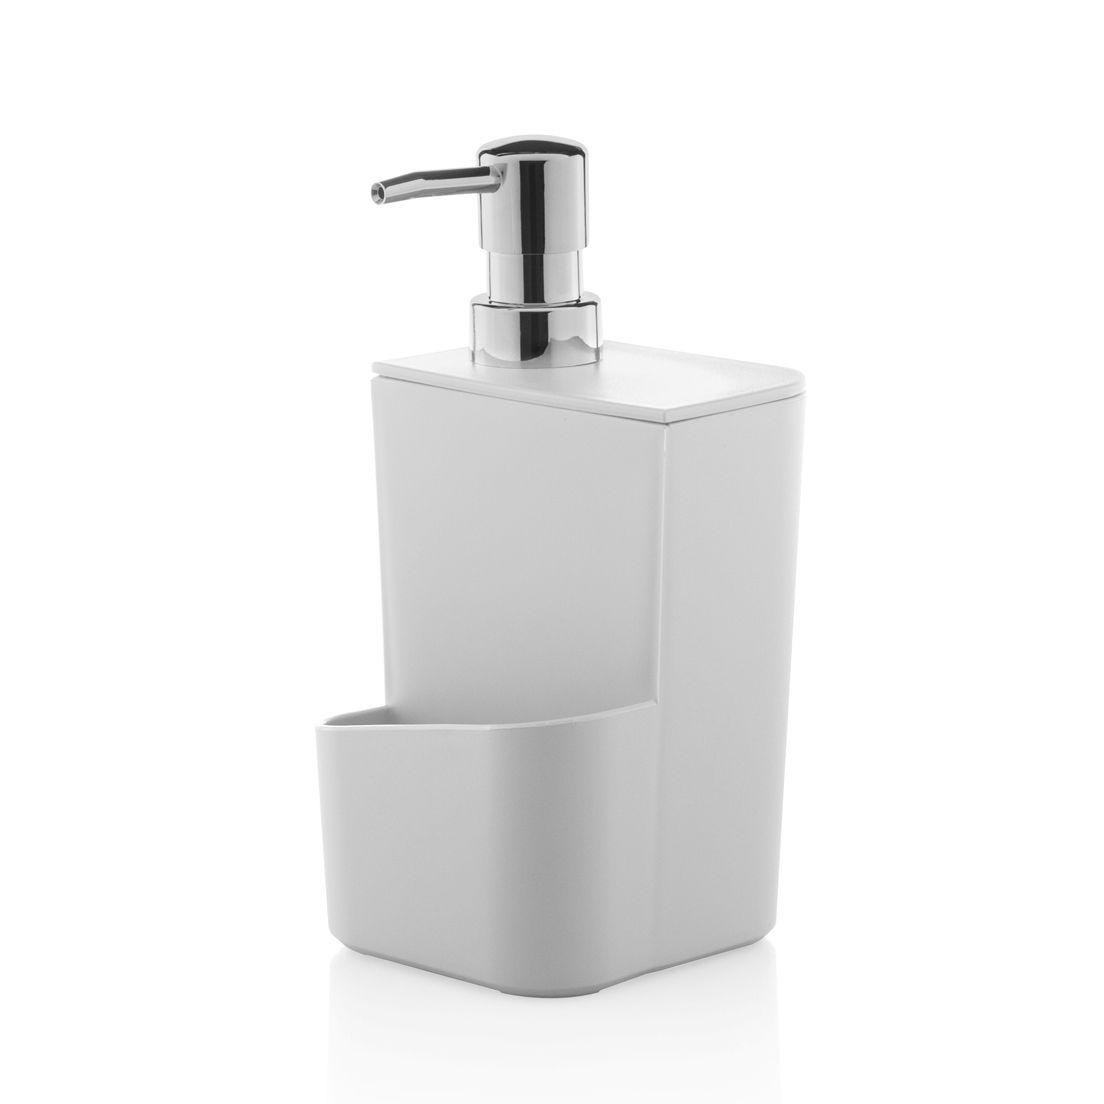 Porta Detergente de Polipropileno Infinity Branco 650Ml